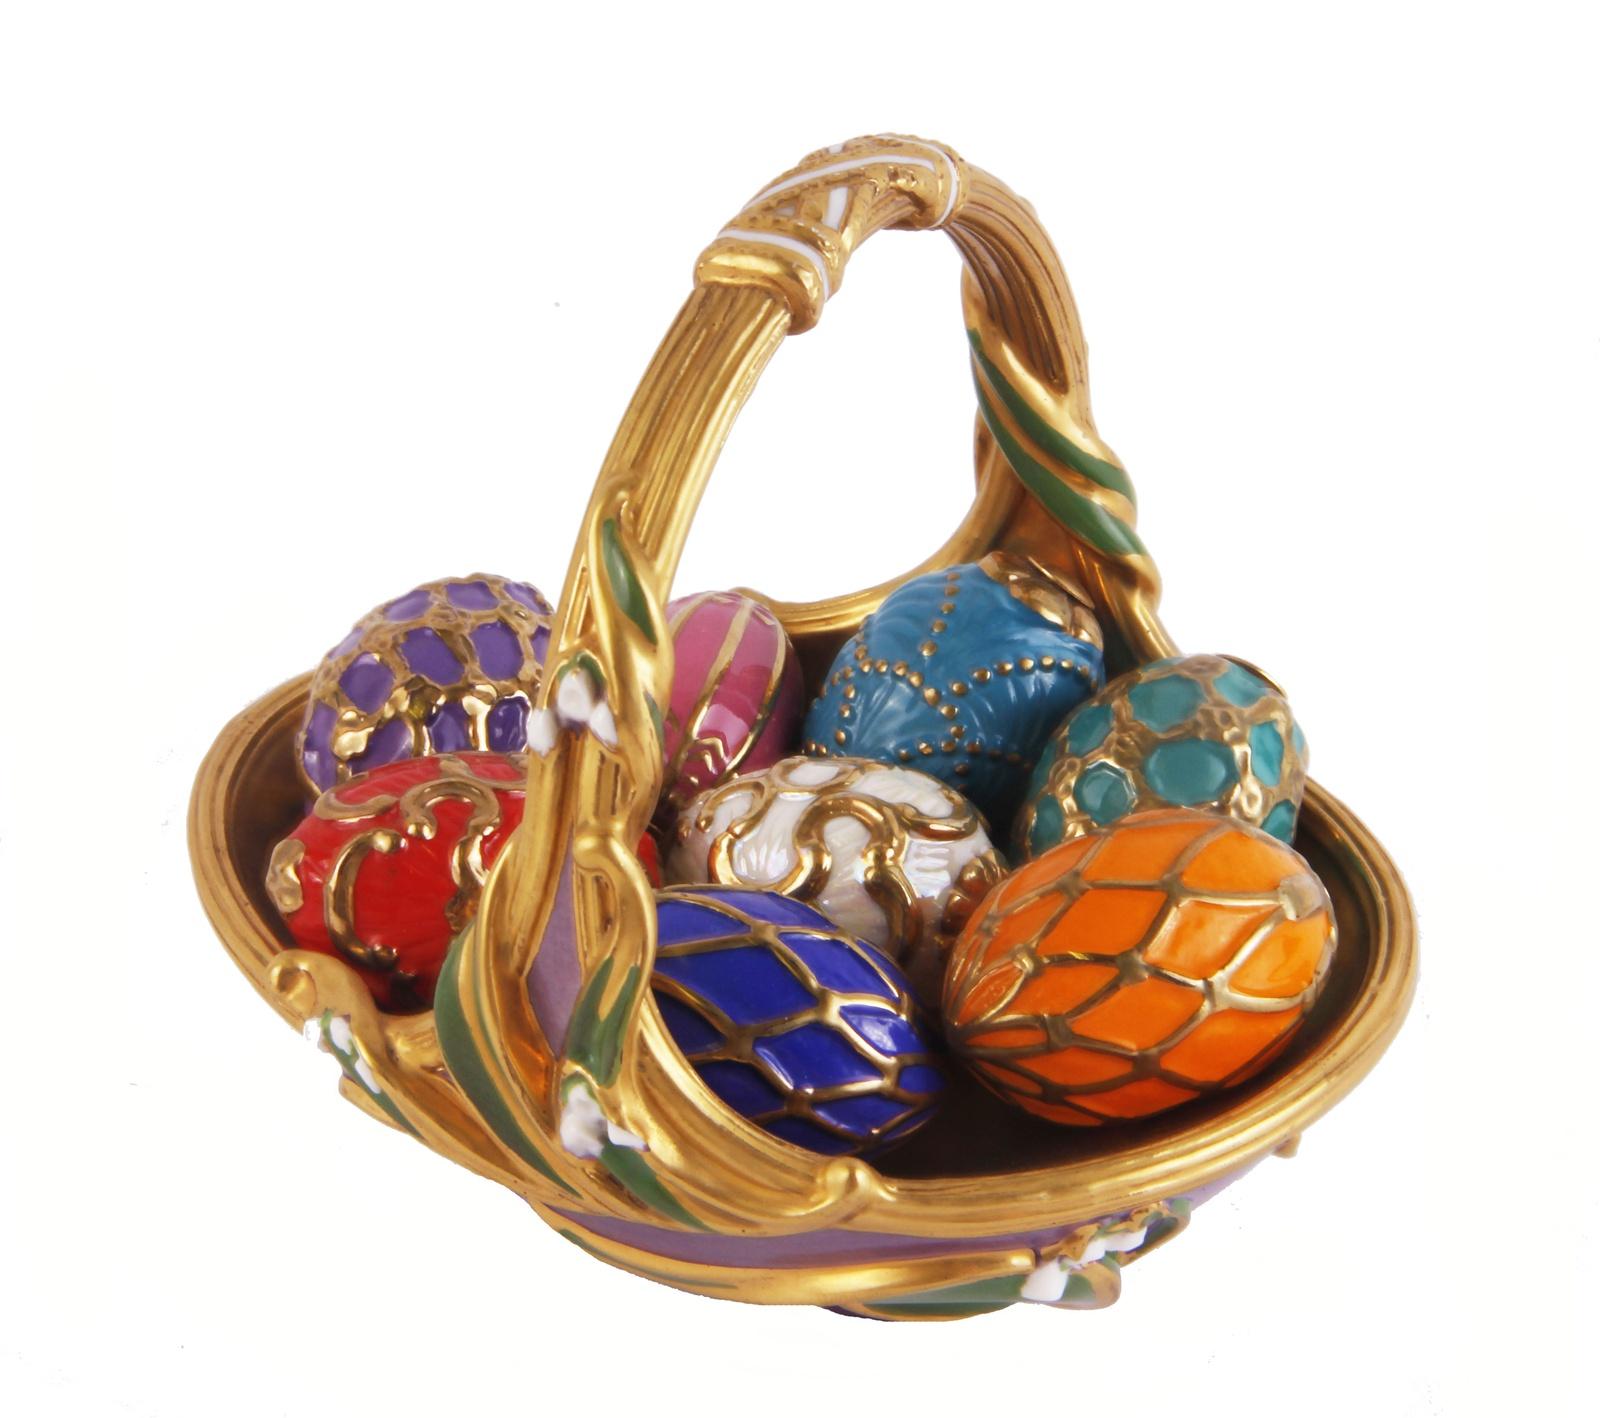 Композиция Весенняя корзина с яйцами. Фарфор, роспись, House of Faberge, 90-е гг. ХХ века тарелка ландыши фарфор деколь house of faberge 90 е гг хх века